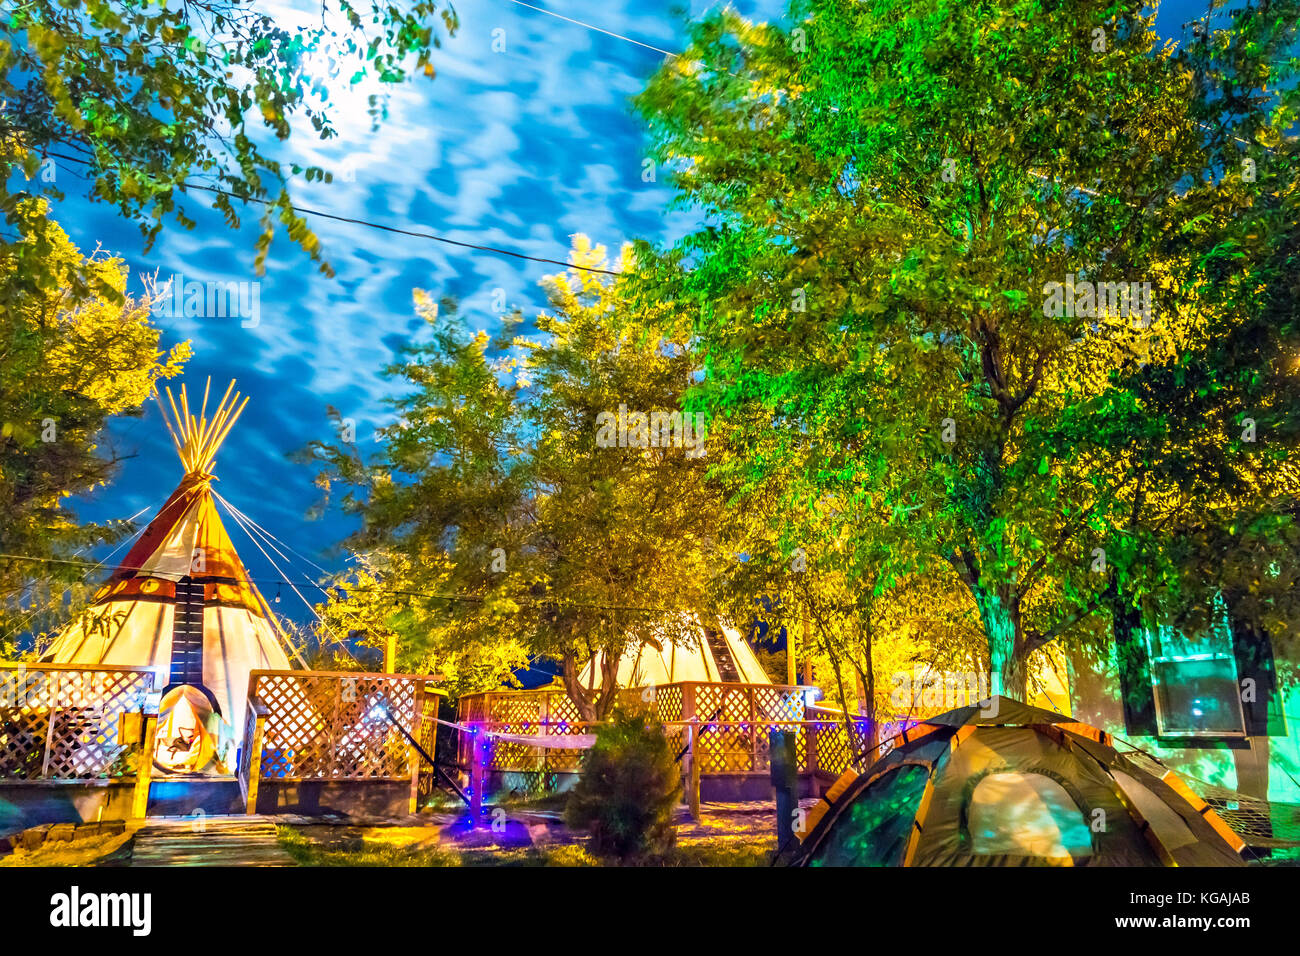 Olancha California Camping in Teepees Tipi Tepees at Olancha RV Park and Motel - Stock Image